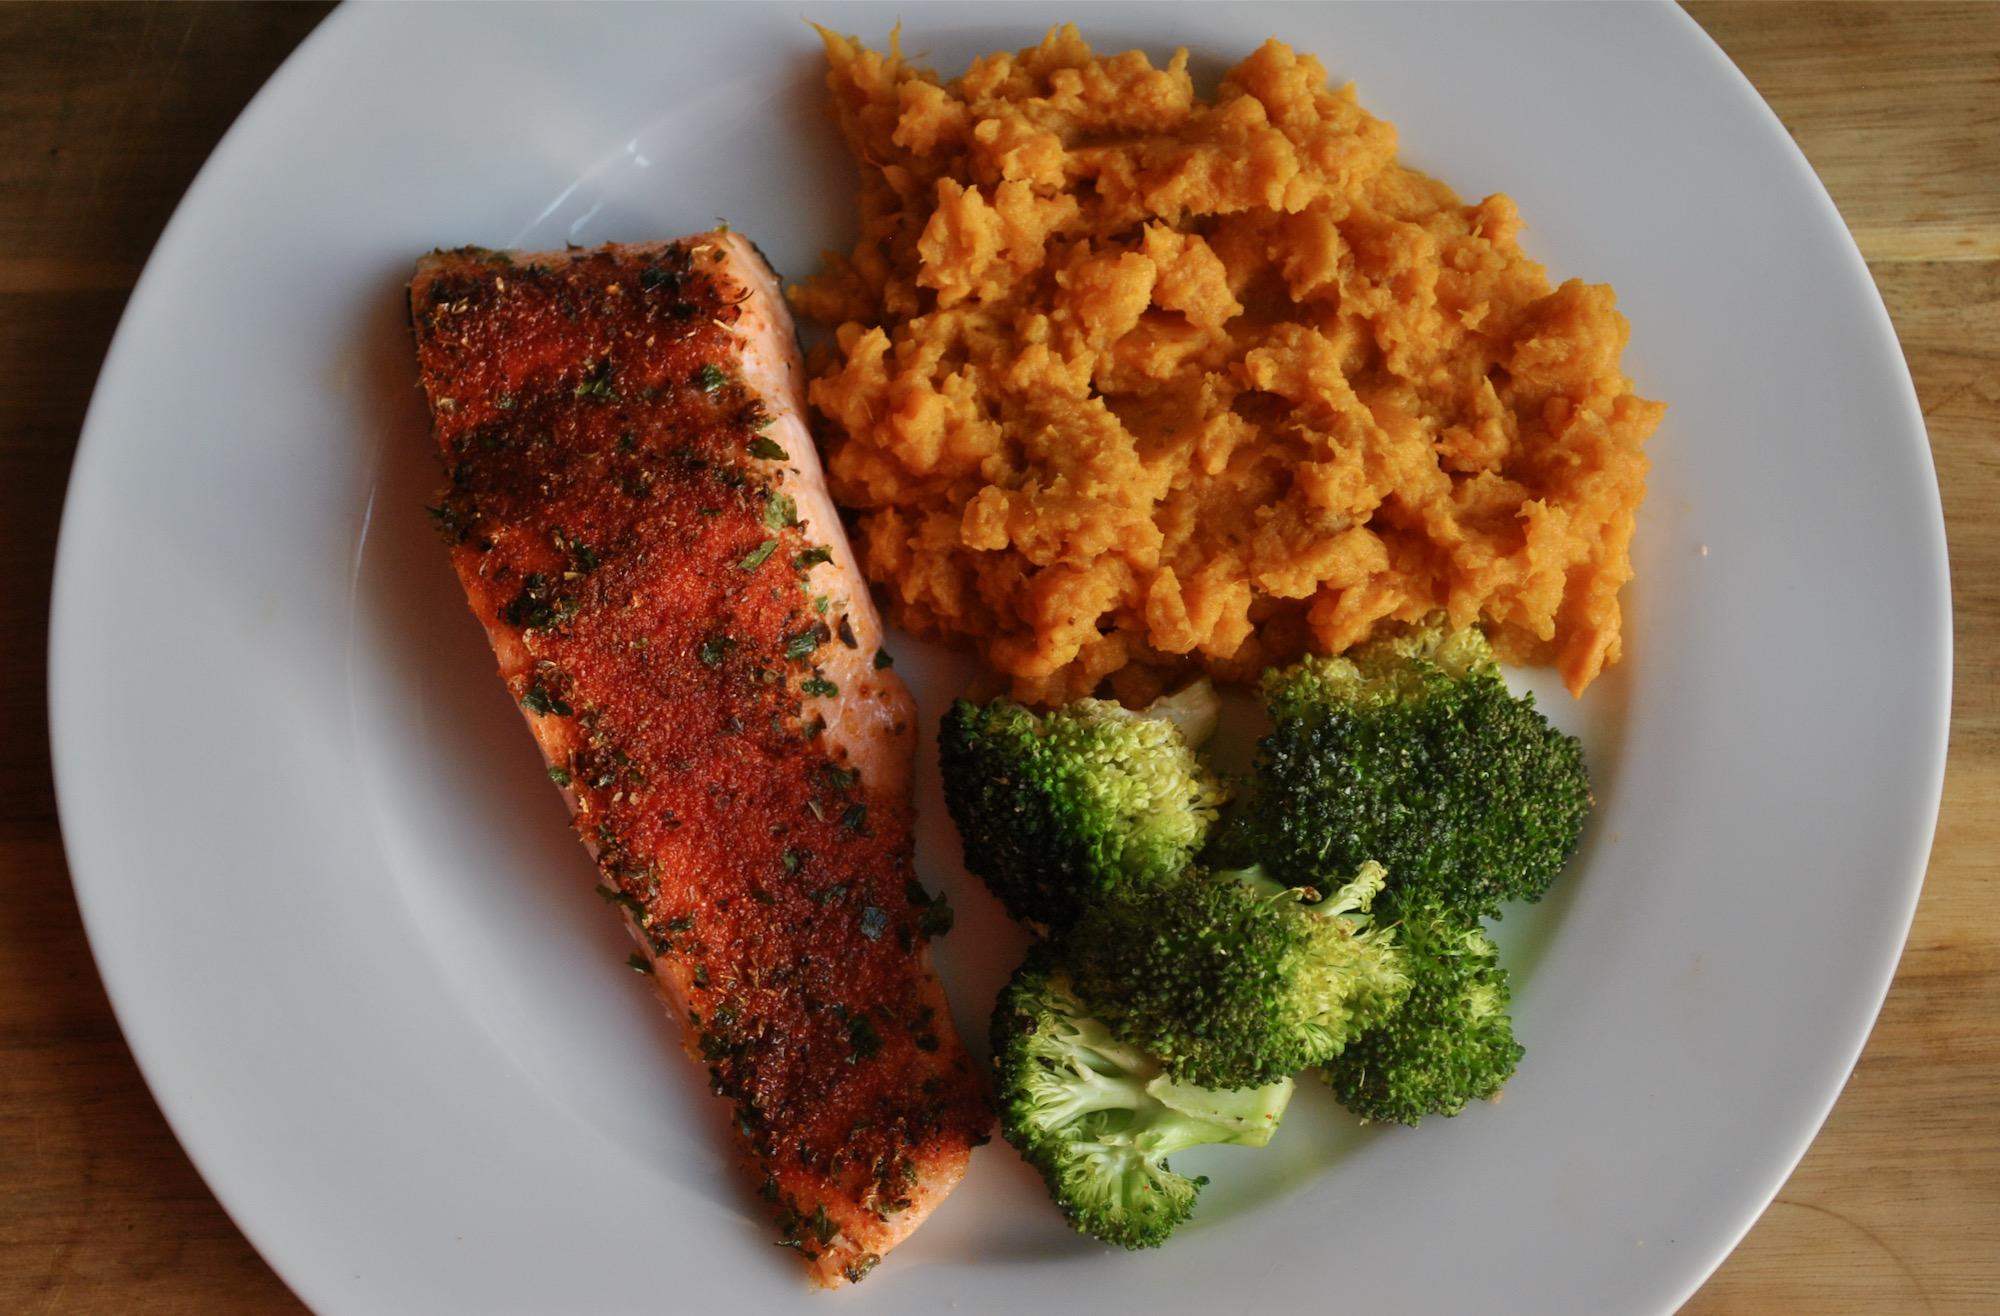 Healthy Baked Cajun Salmon With Sweet Potato Mash Recipe Student Recipes Student Eats